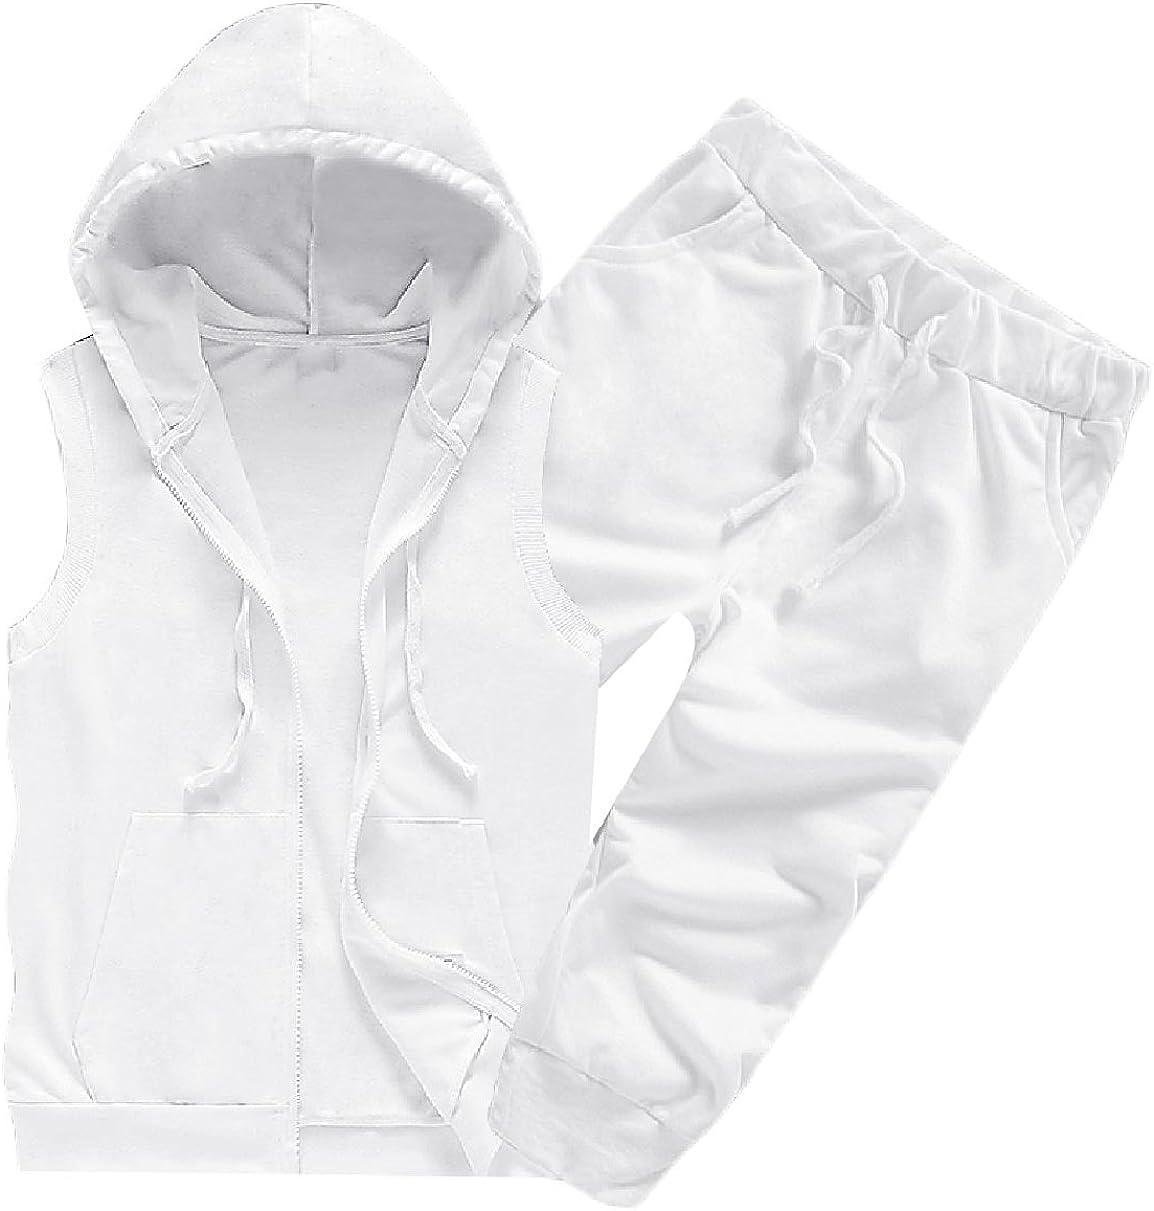 Howme Mens 2 Piece Set Hoode Half Pants Tank Fashion Sleeveless Sweatsuit